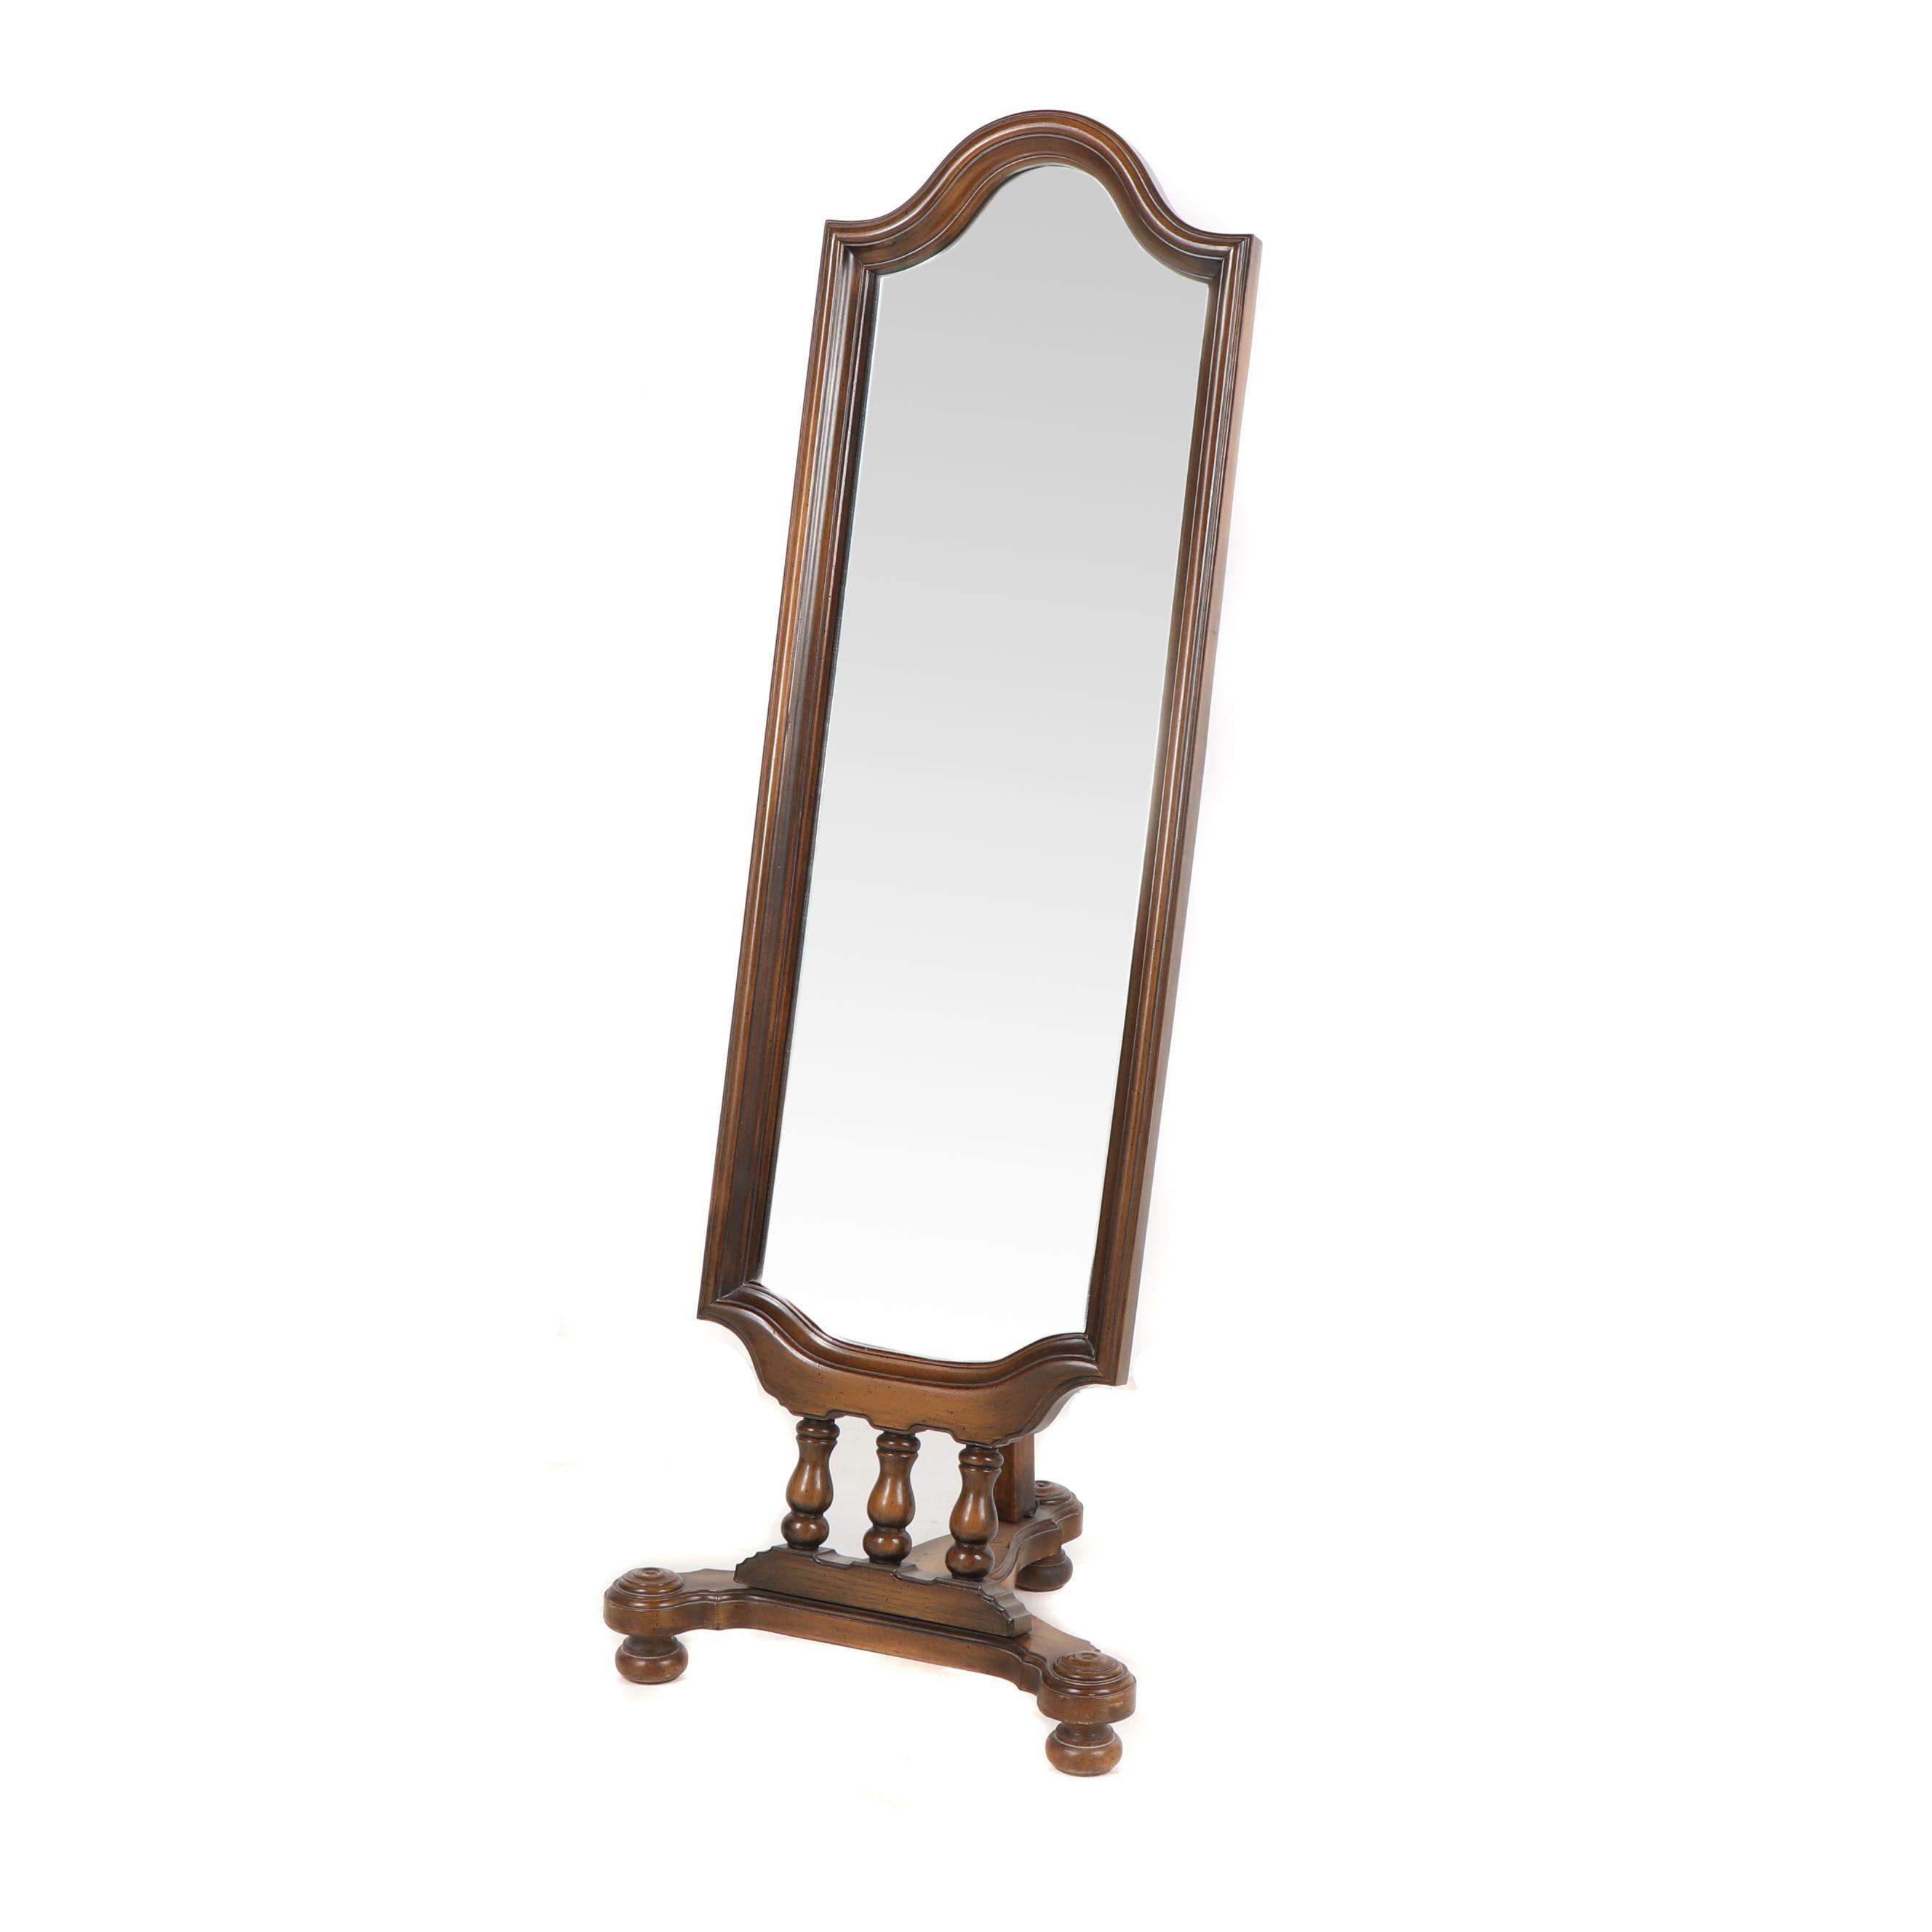 Standing Wood Framed Dressing Mirror